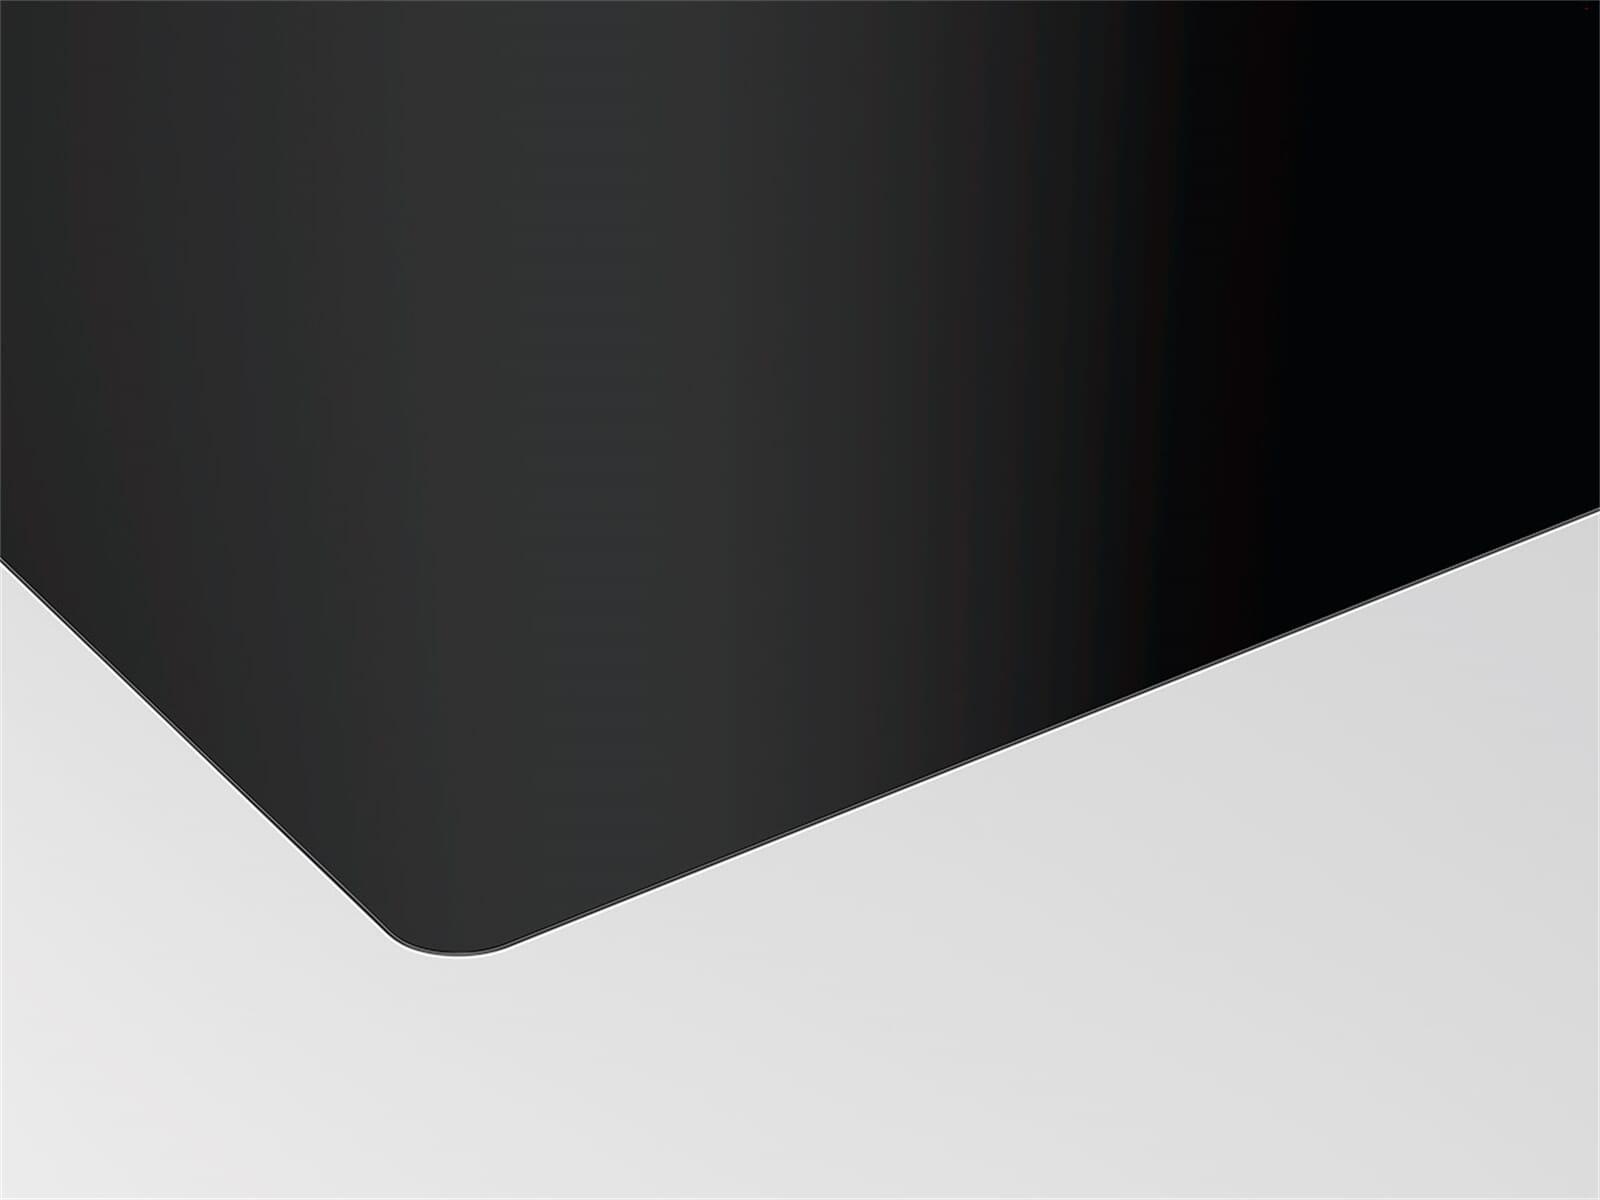 siemens ex901kxw1e induktionskochfeld autark. Black Bedroom Furniture Sets. Home Design Ideas